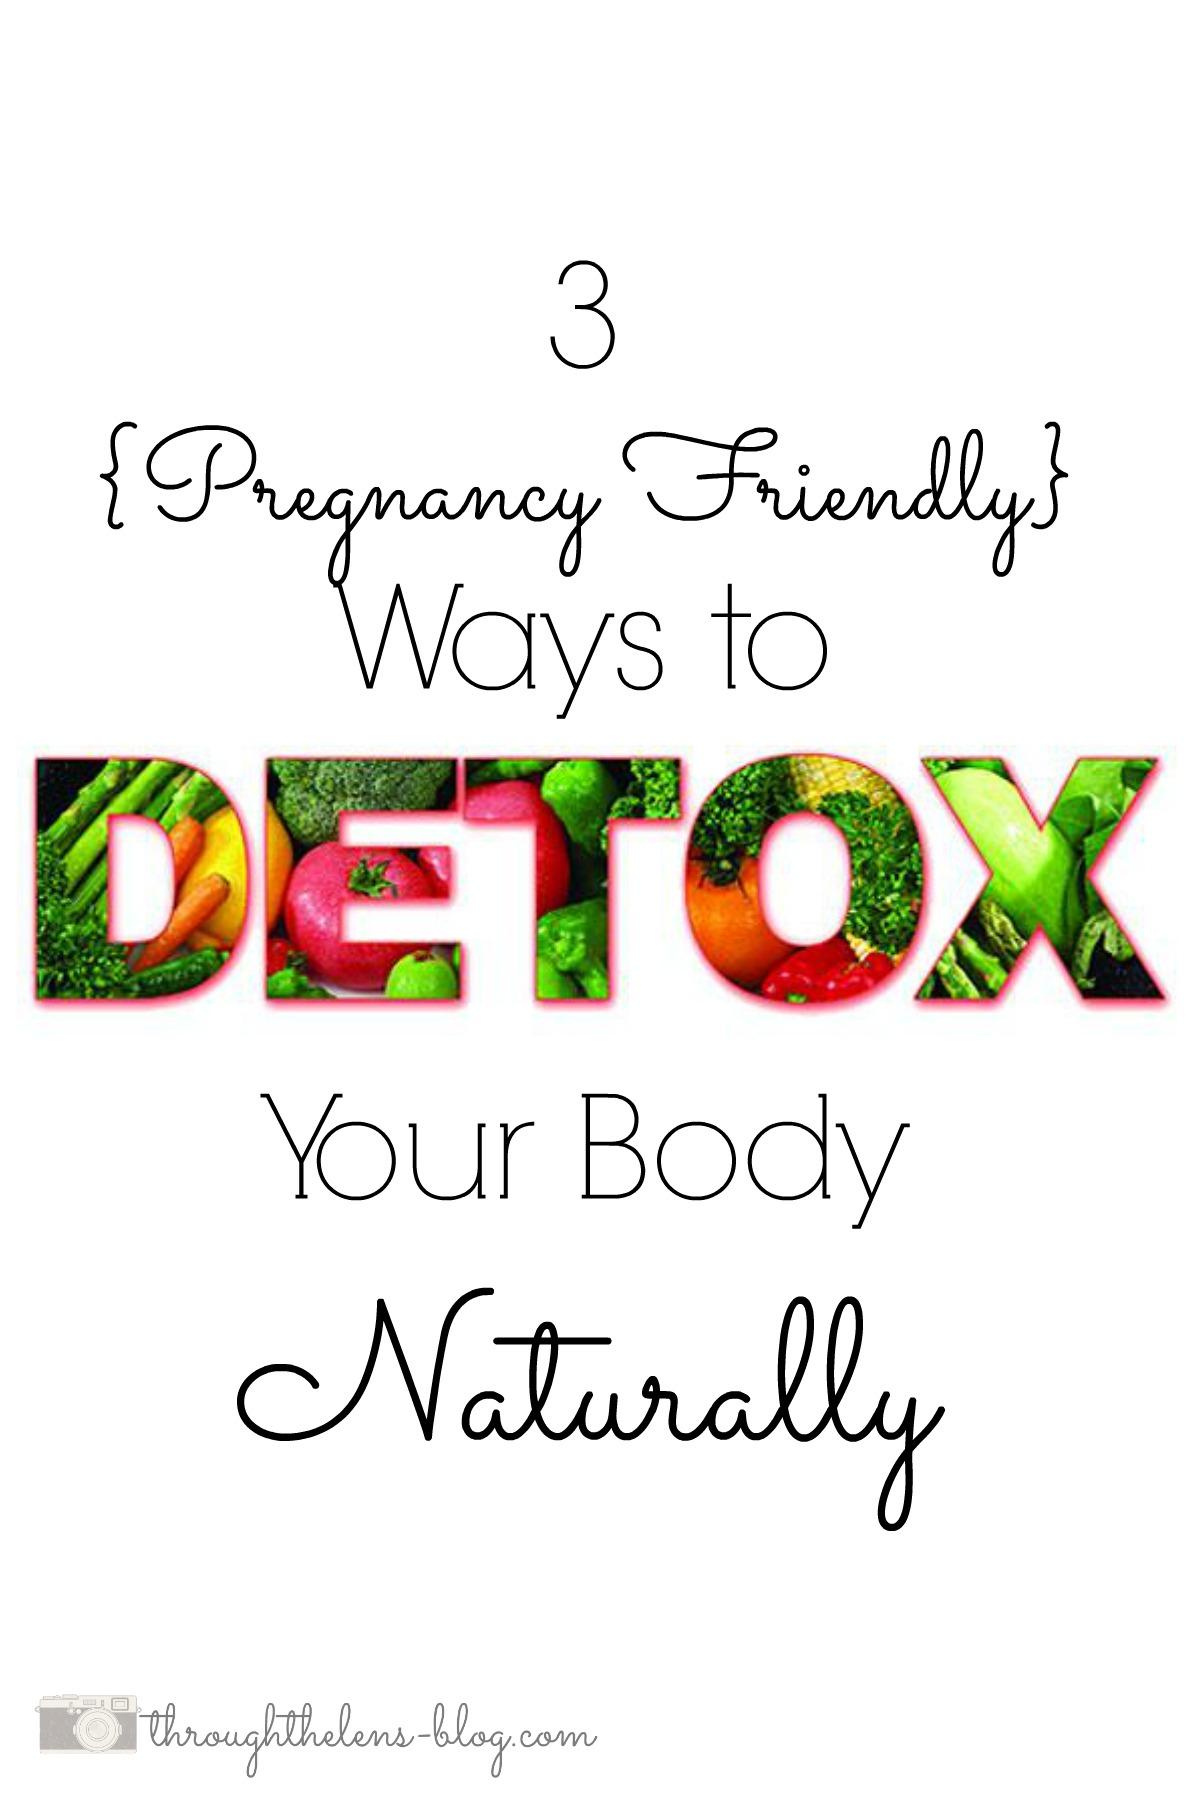 Ways To Detox Naturally